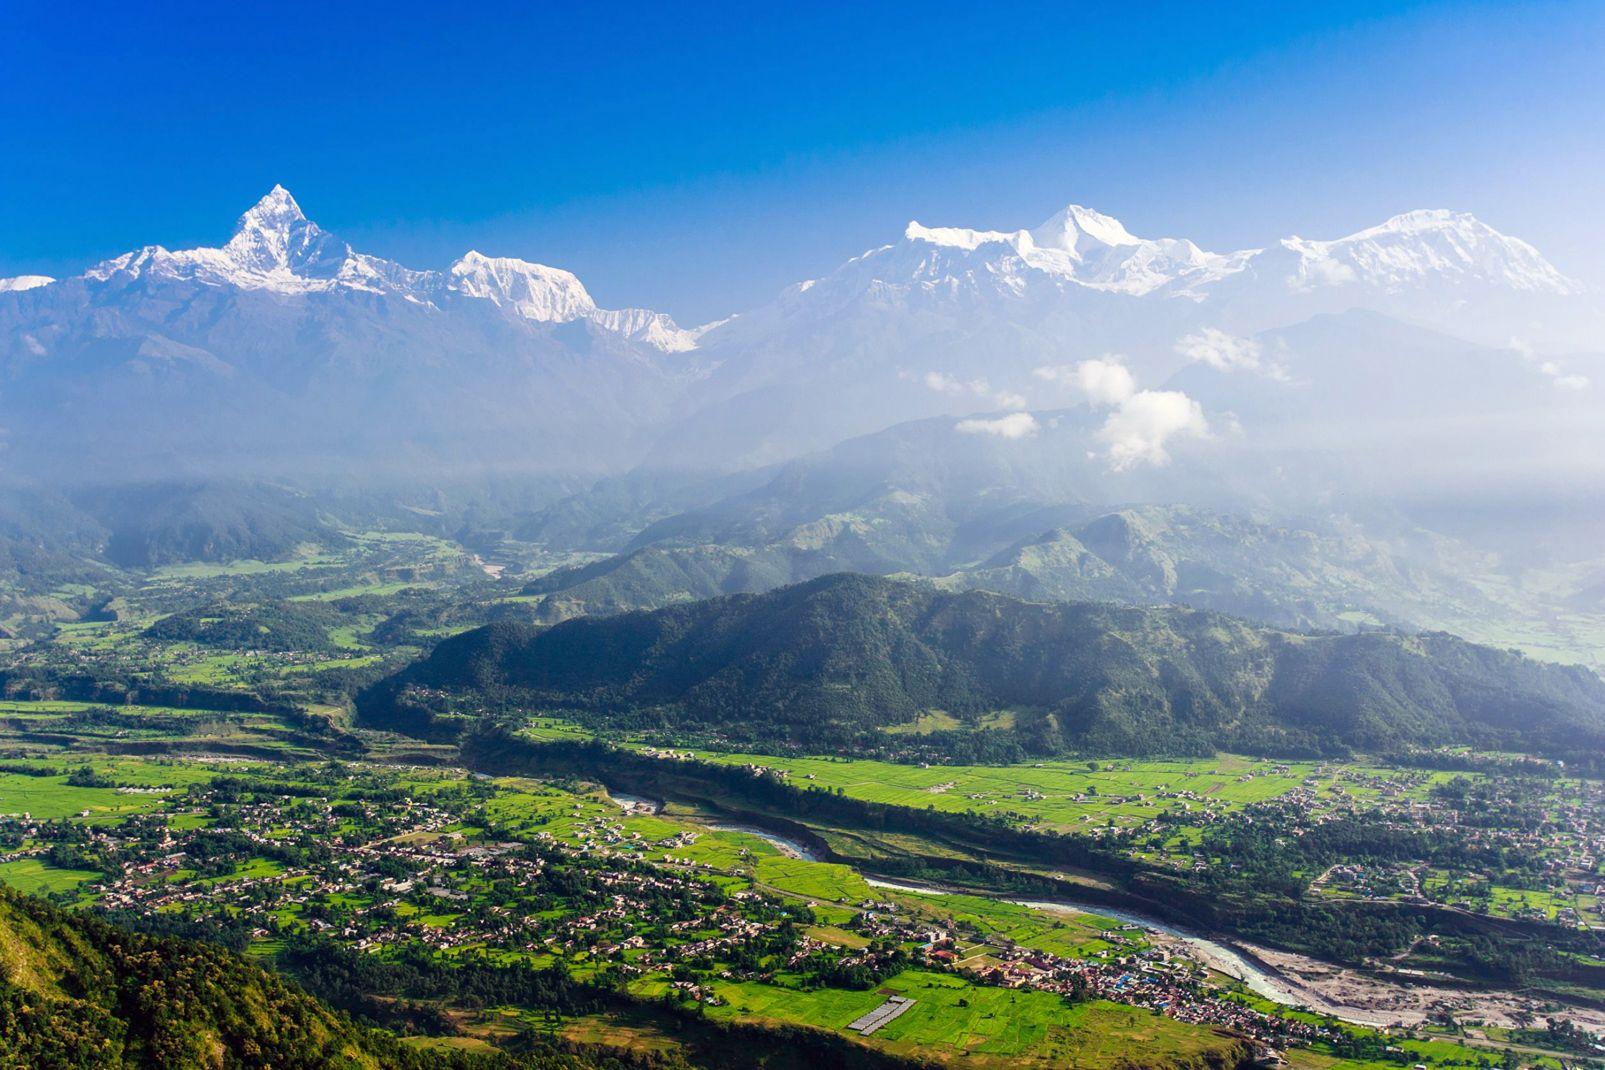 Asie, Népal, himalaya